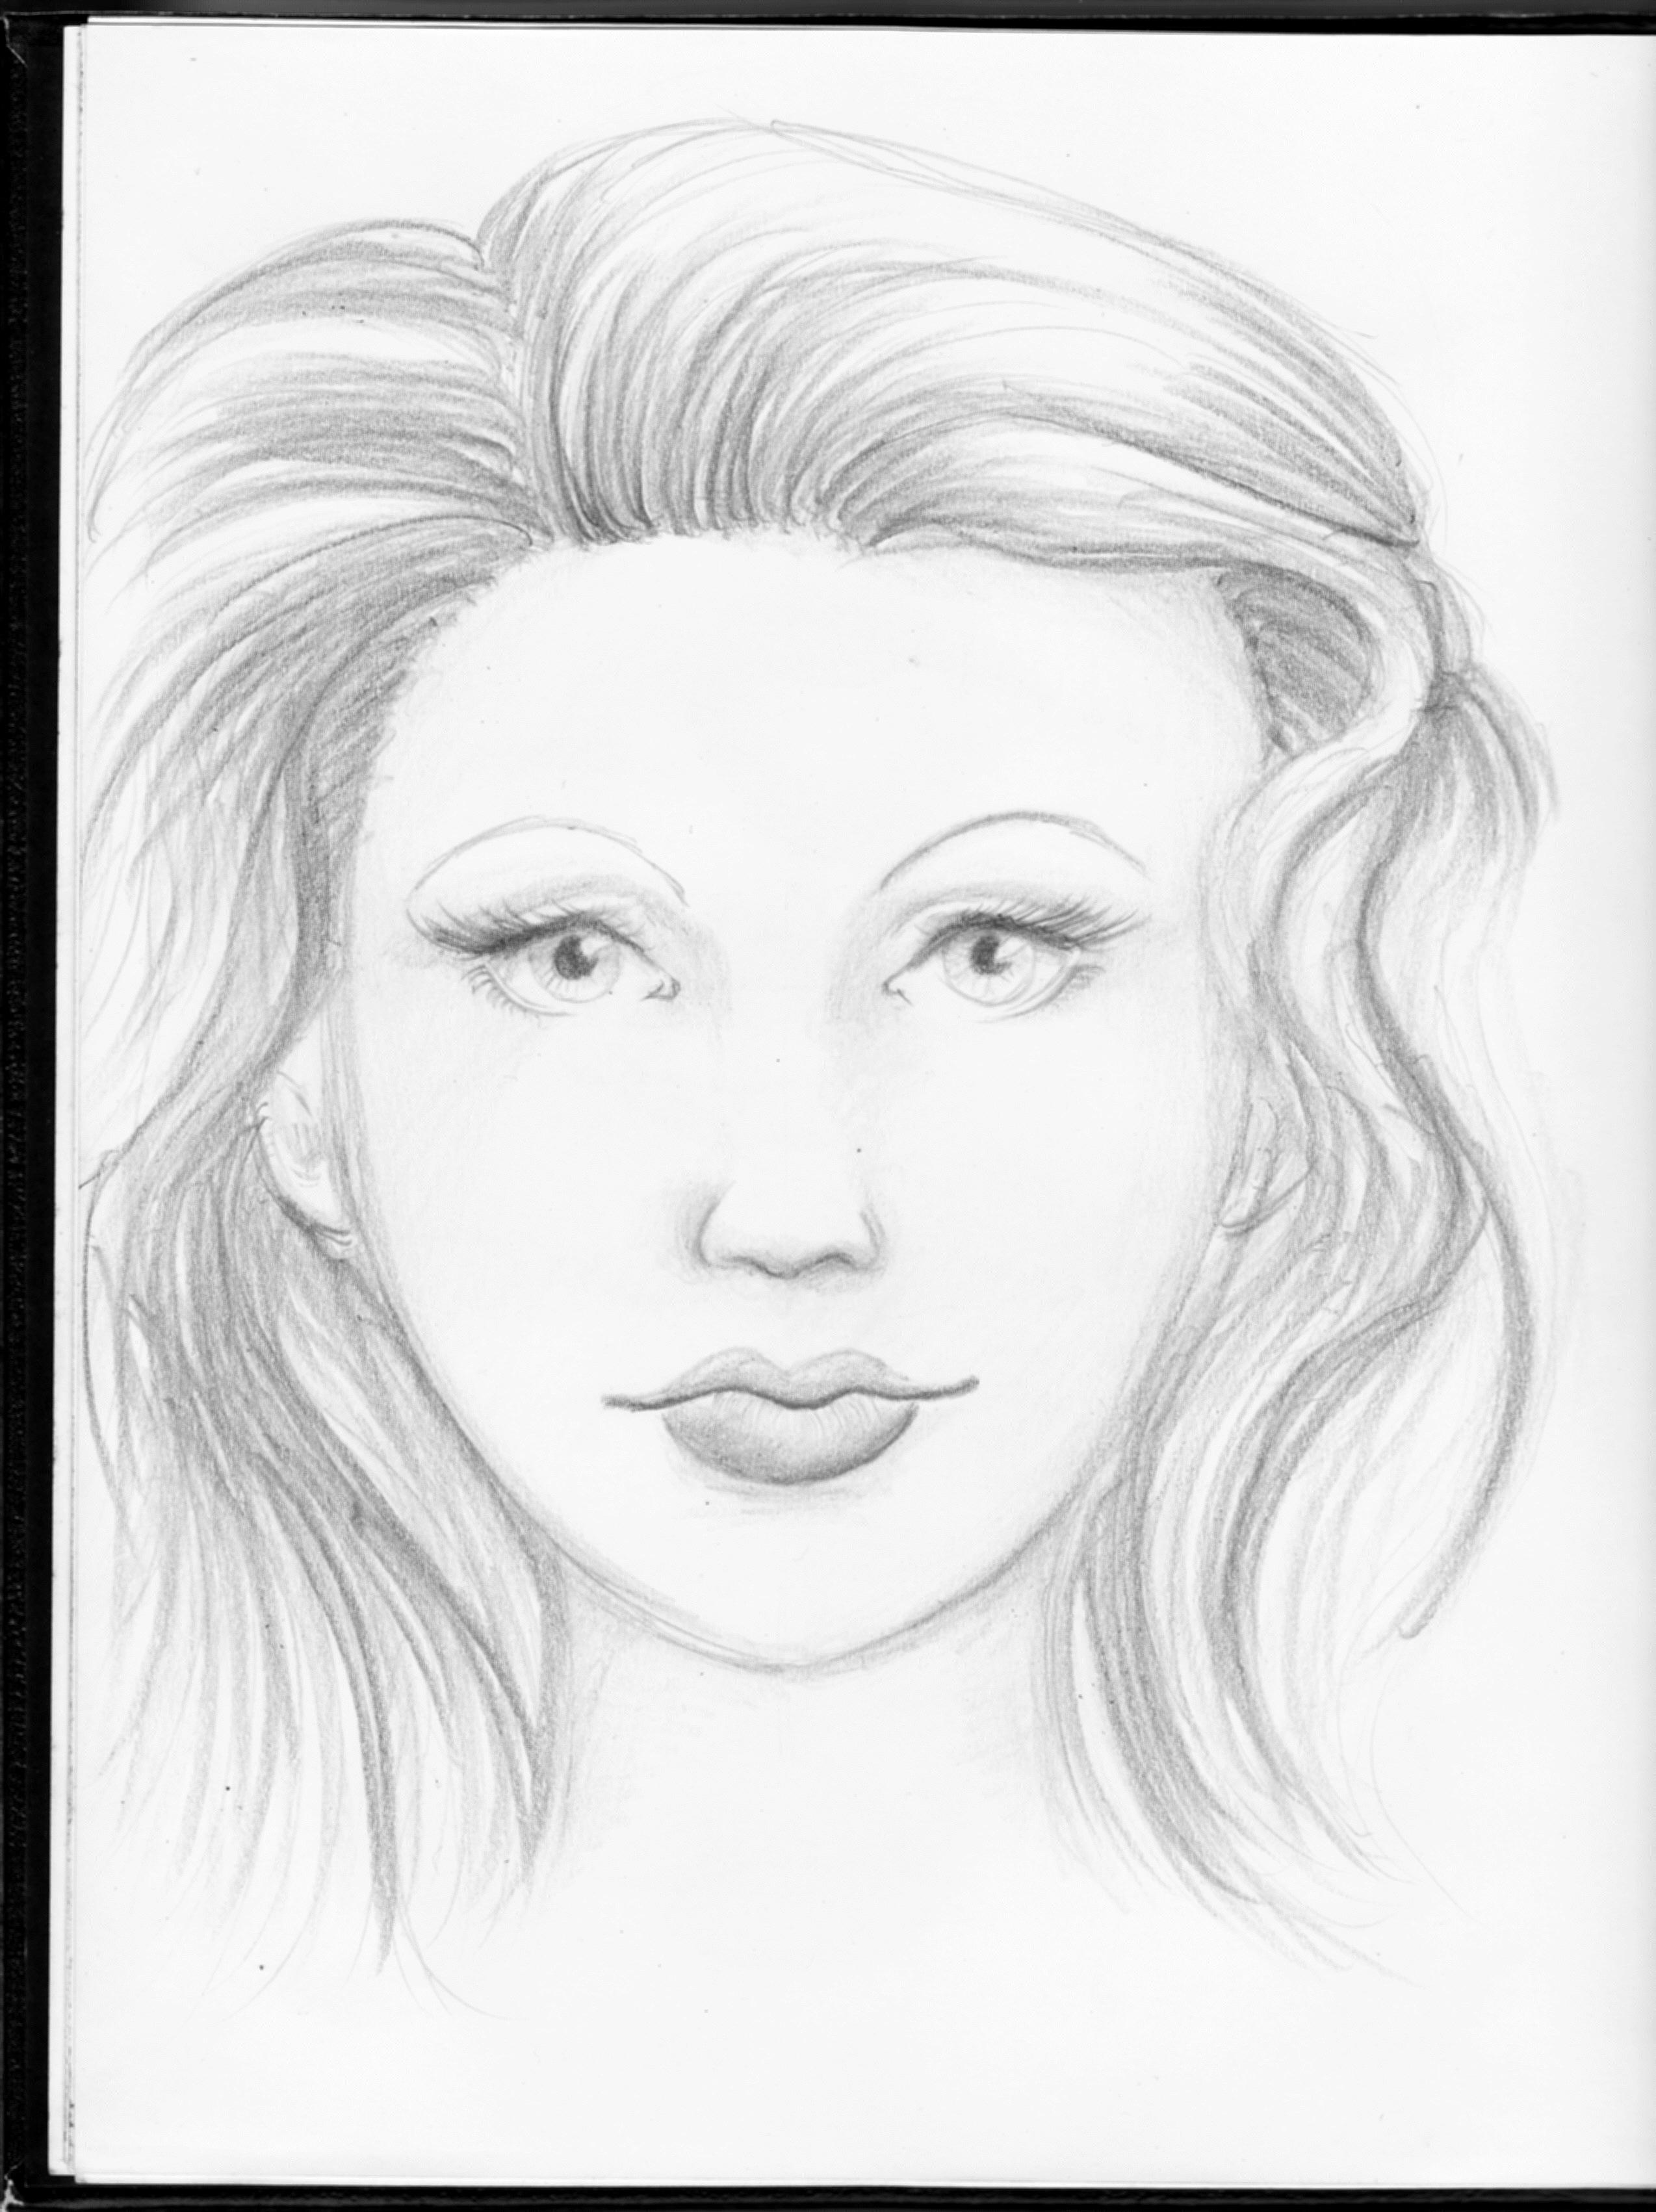 2548x3404 Uncategorized The Artist In Me Page 6